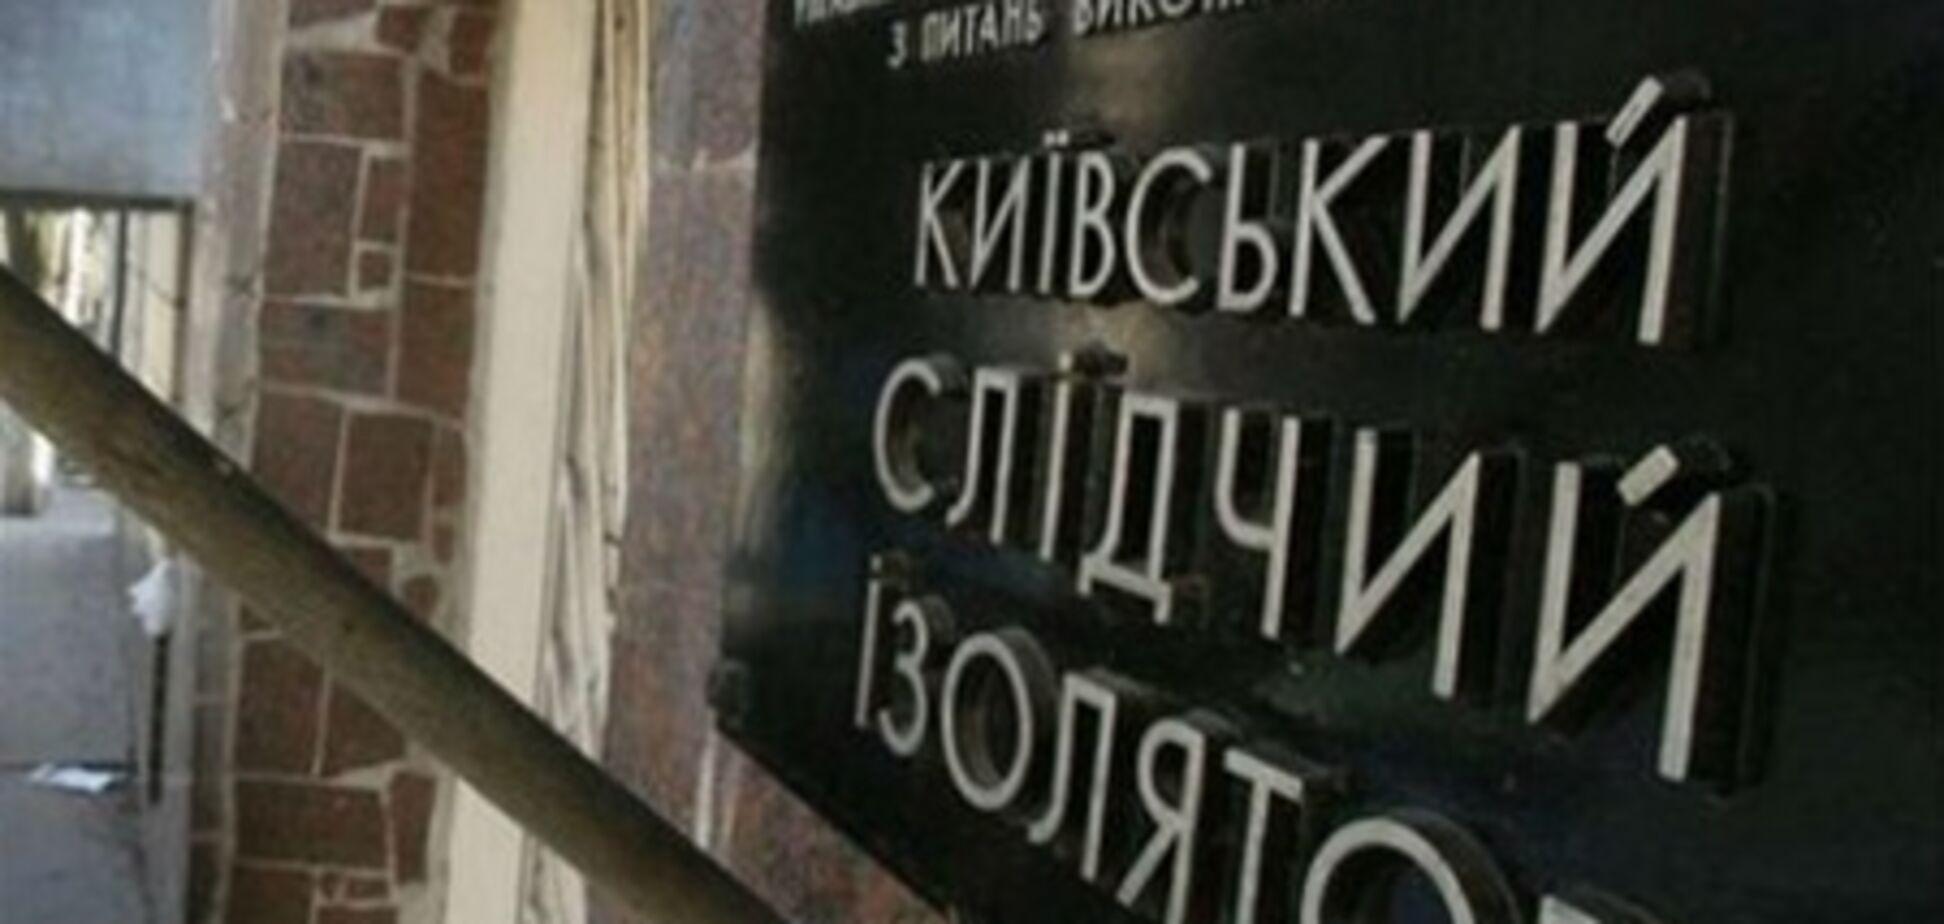 В СИЗО Тимошенко полно тараканов и крыс - Европейский суд